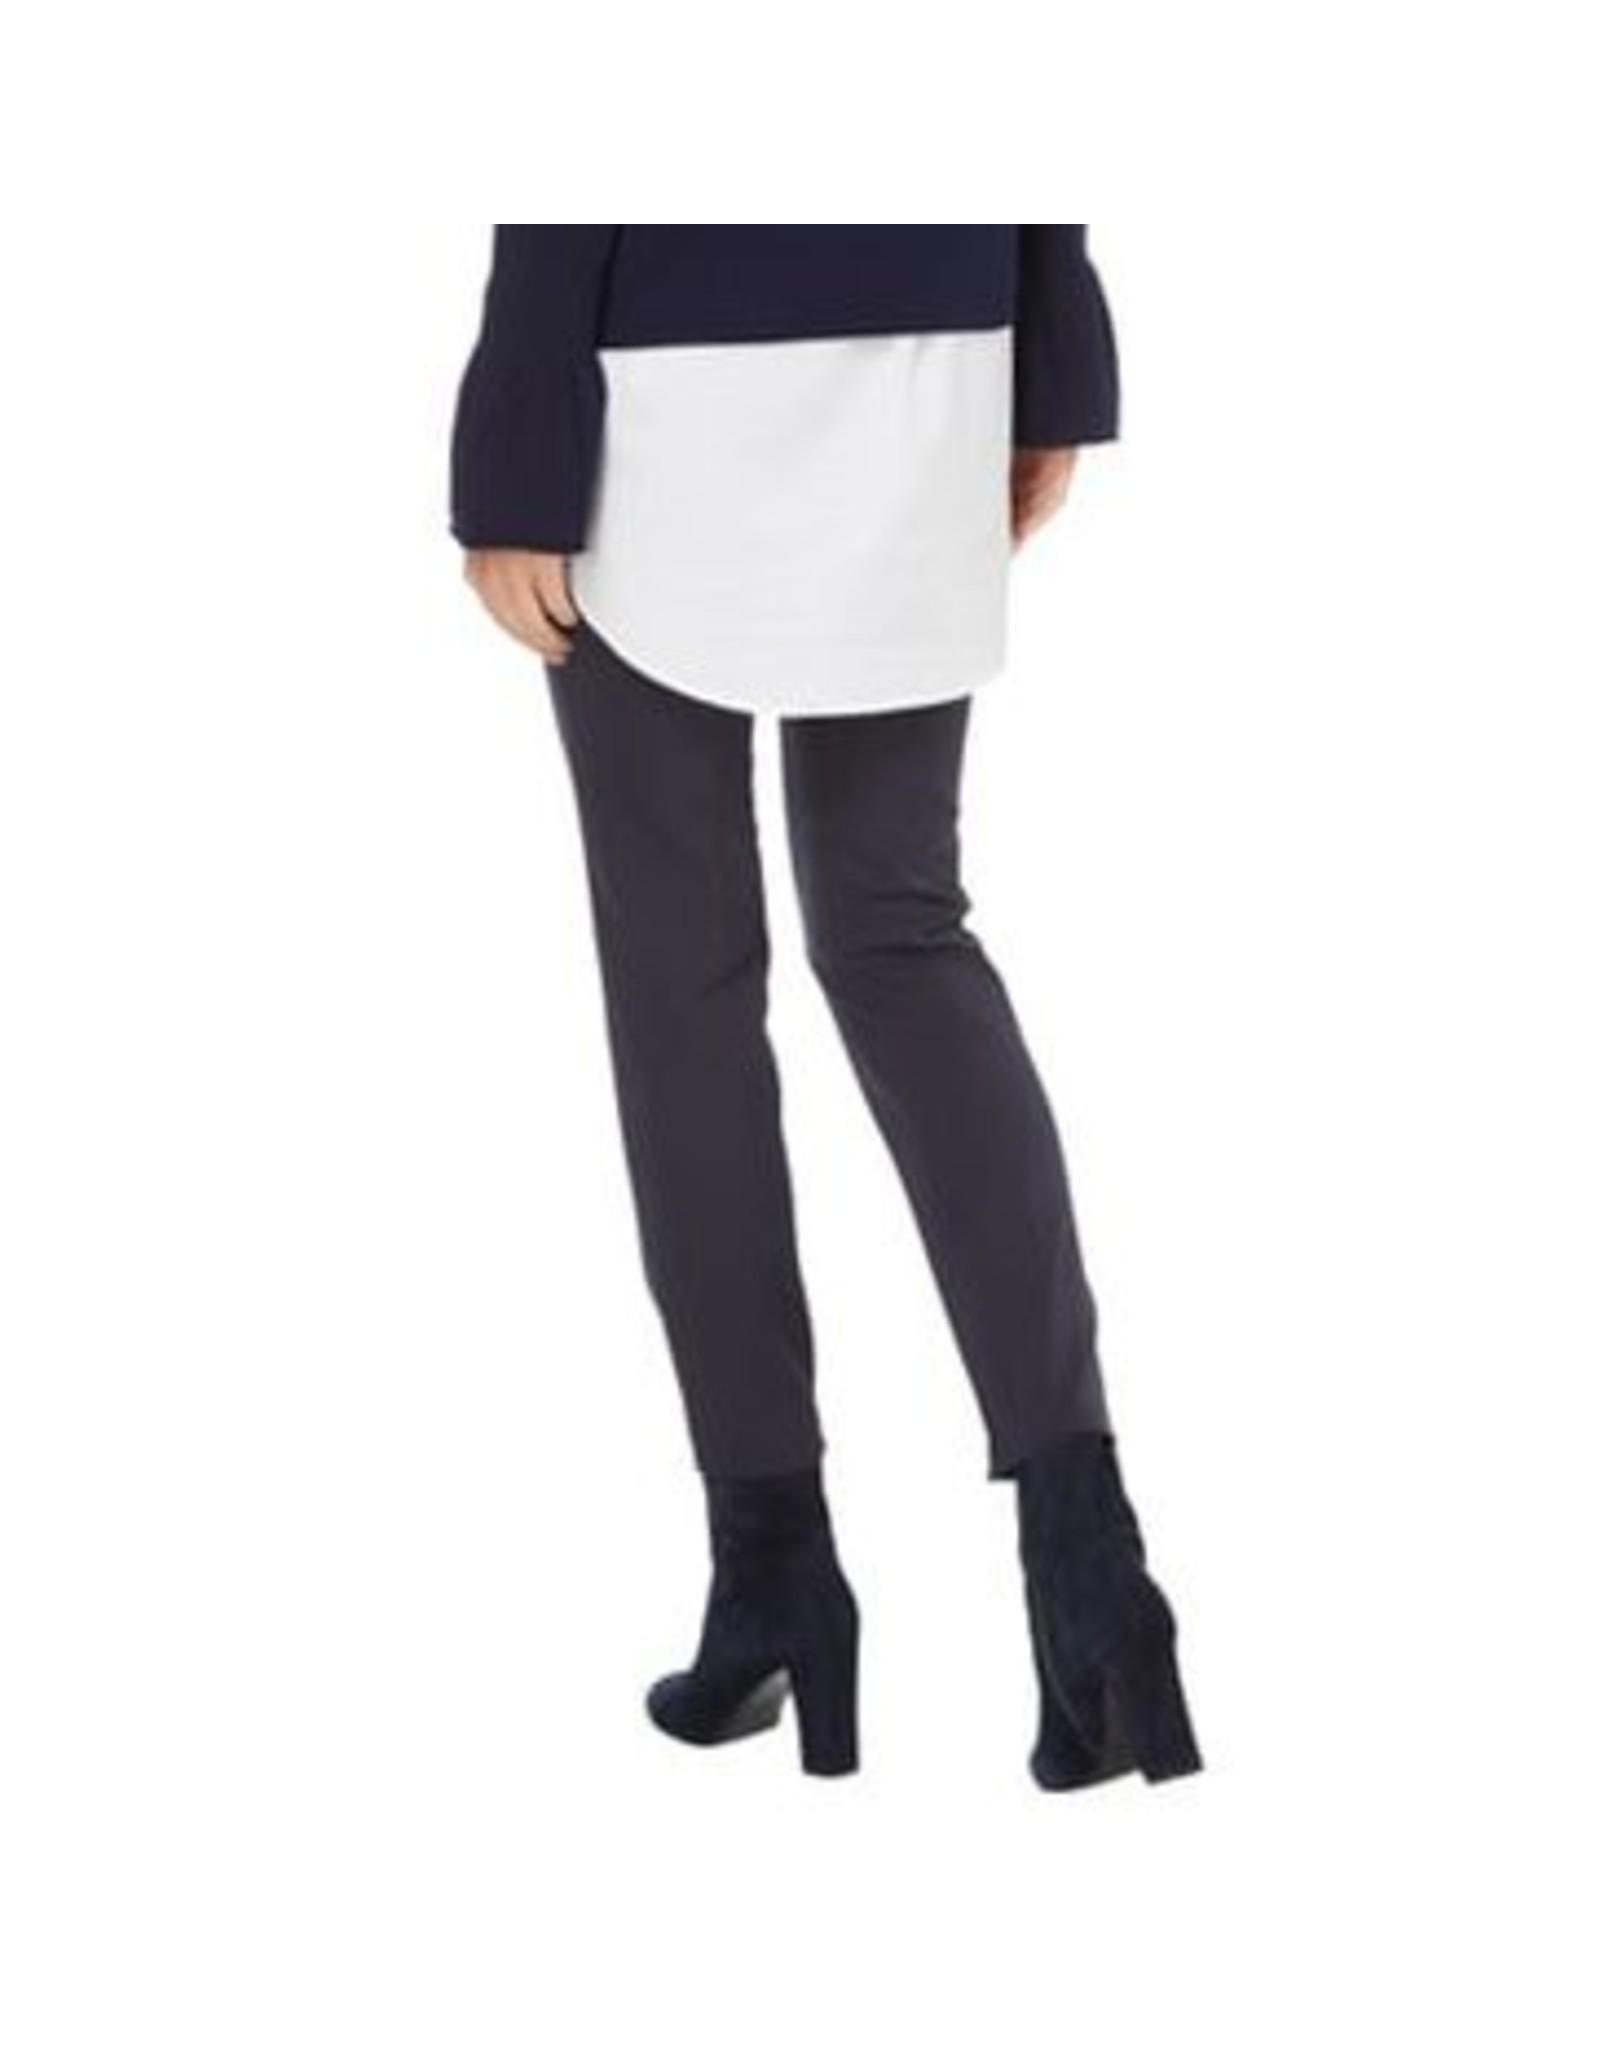 Cambio Cambio Ros Techno Pants - Slate Grey